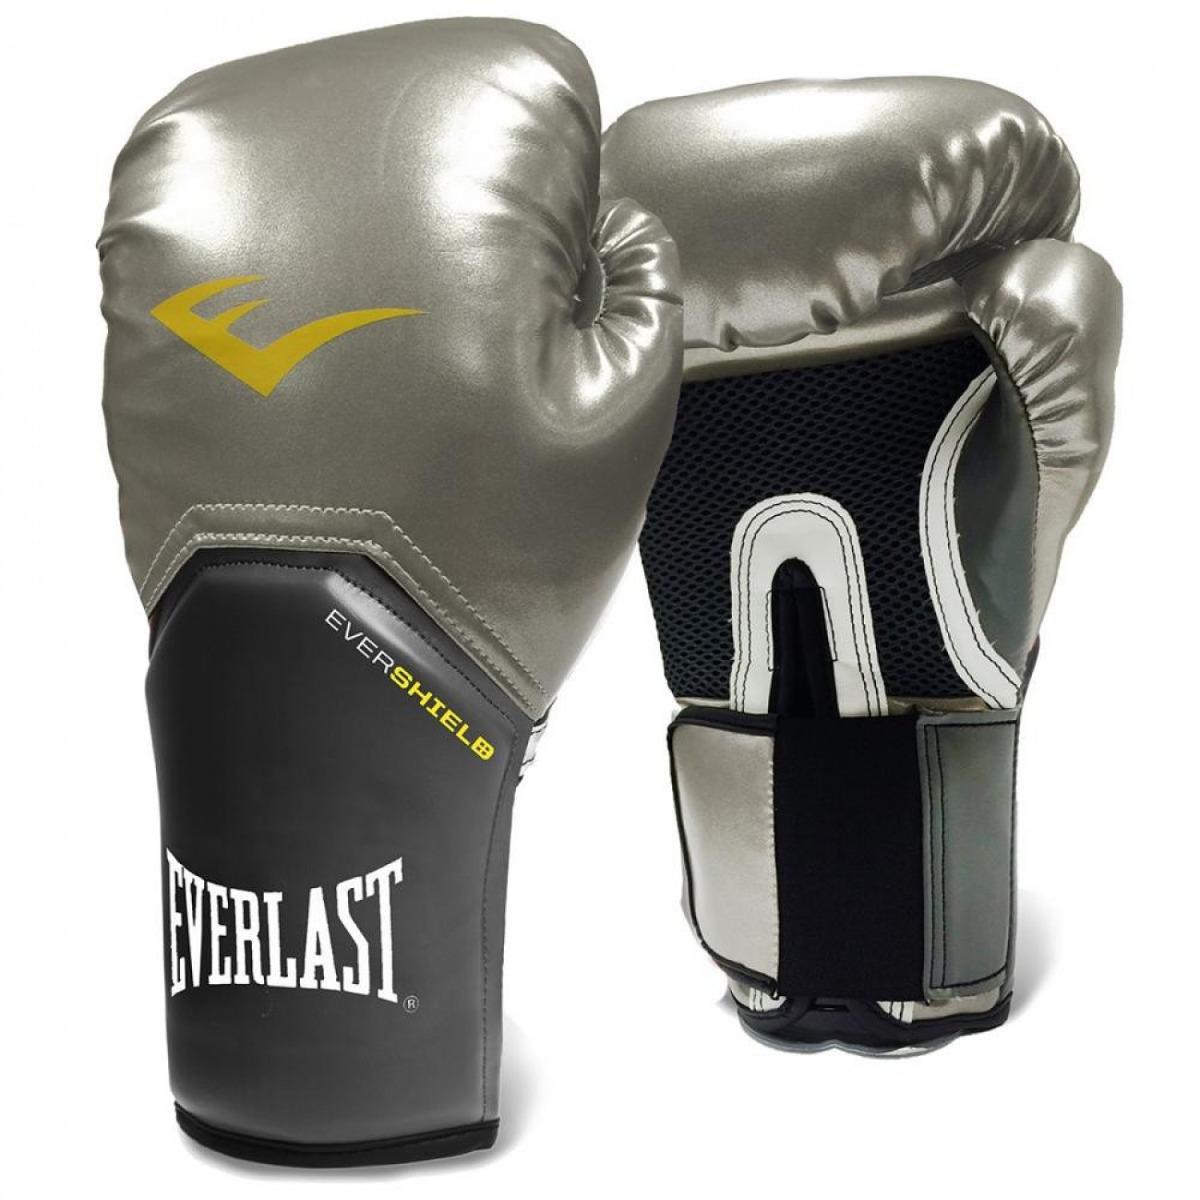 effcaeca9e luva boxe everlast pro style elite training 10 oz prateada. Carregando zoom.